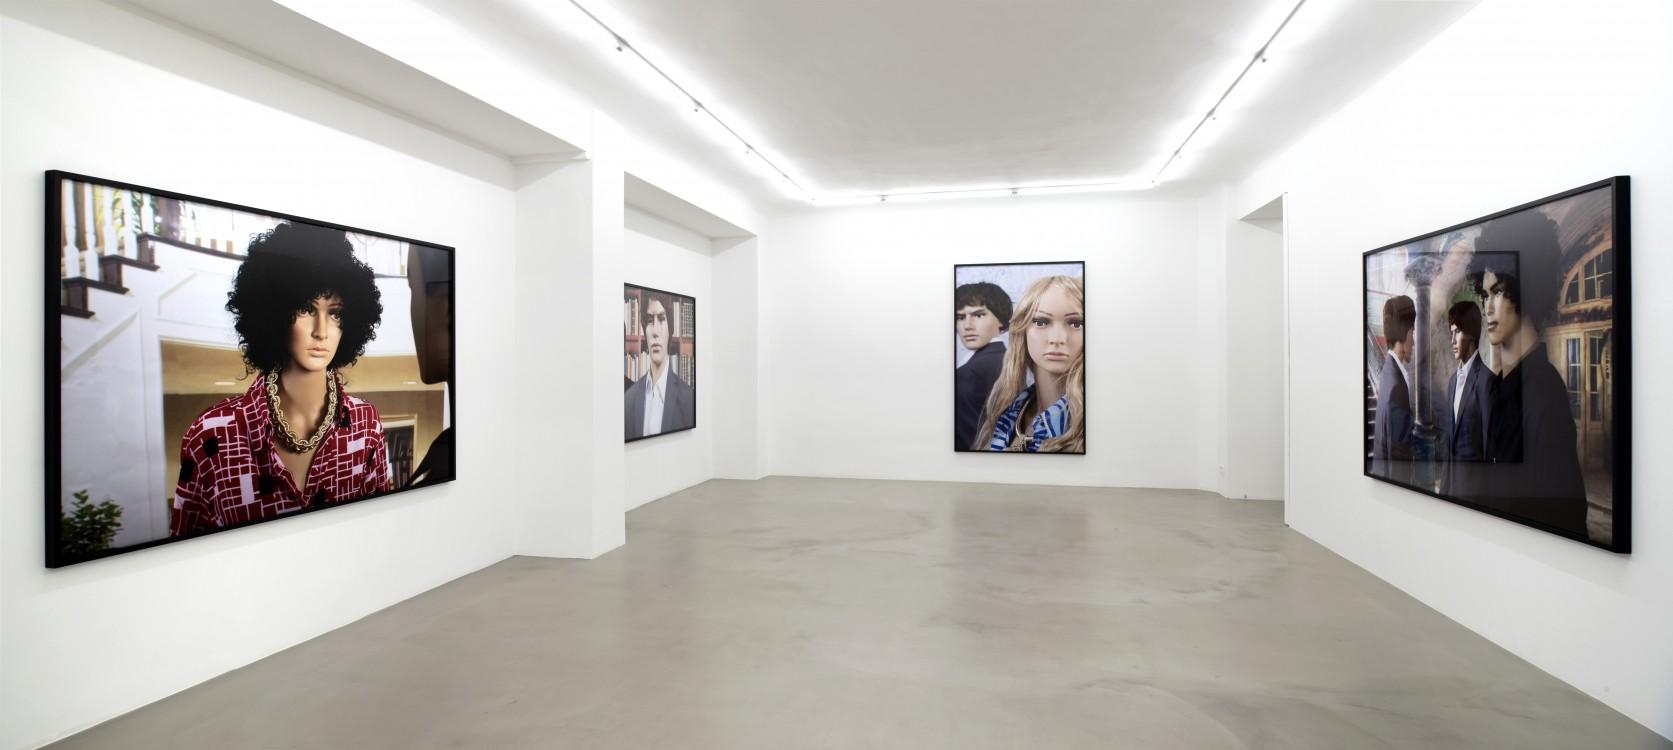 Other Subjectivities Meyer Riegger Galerie, 2019